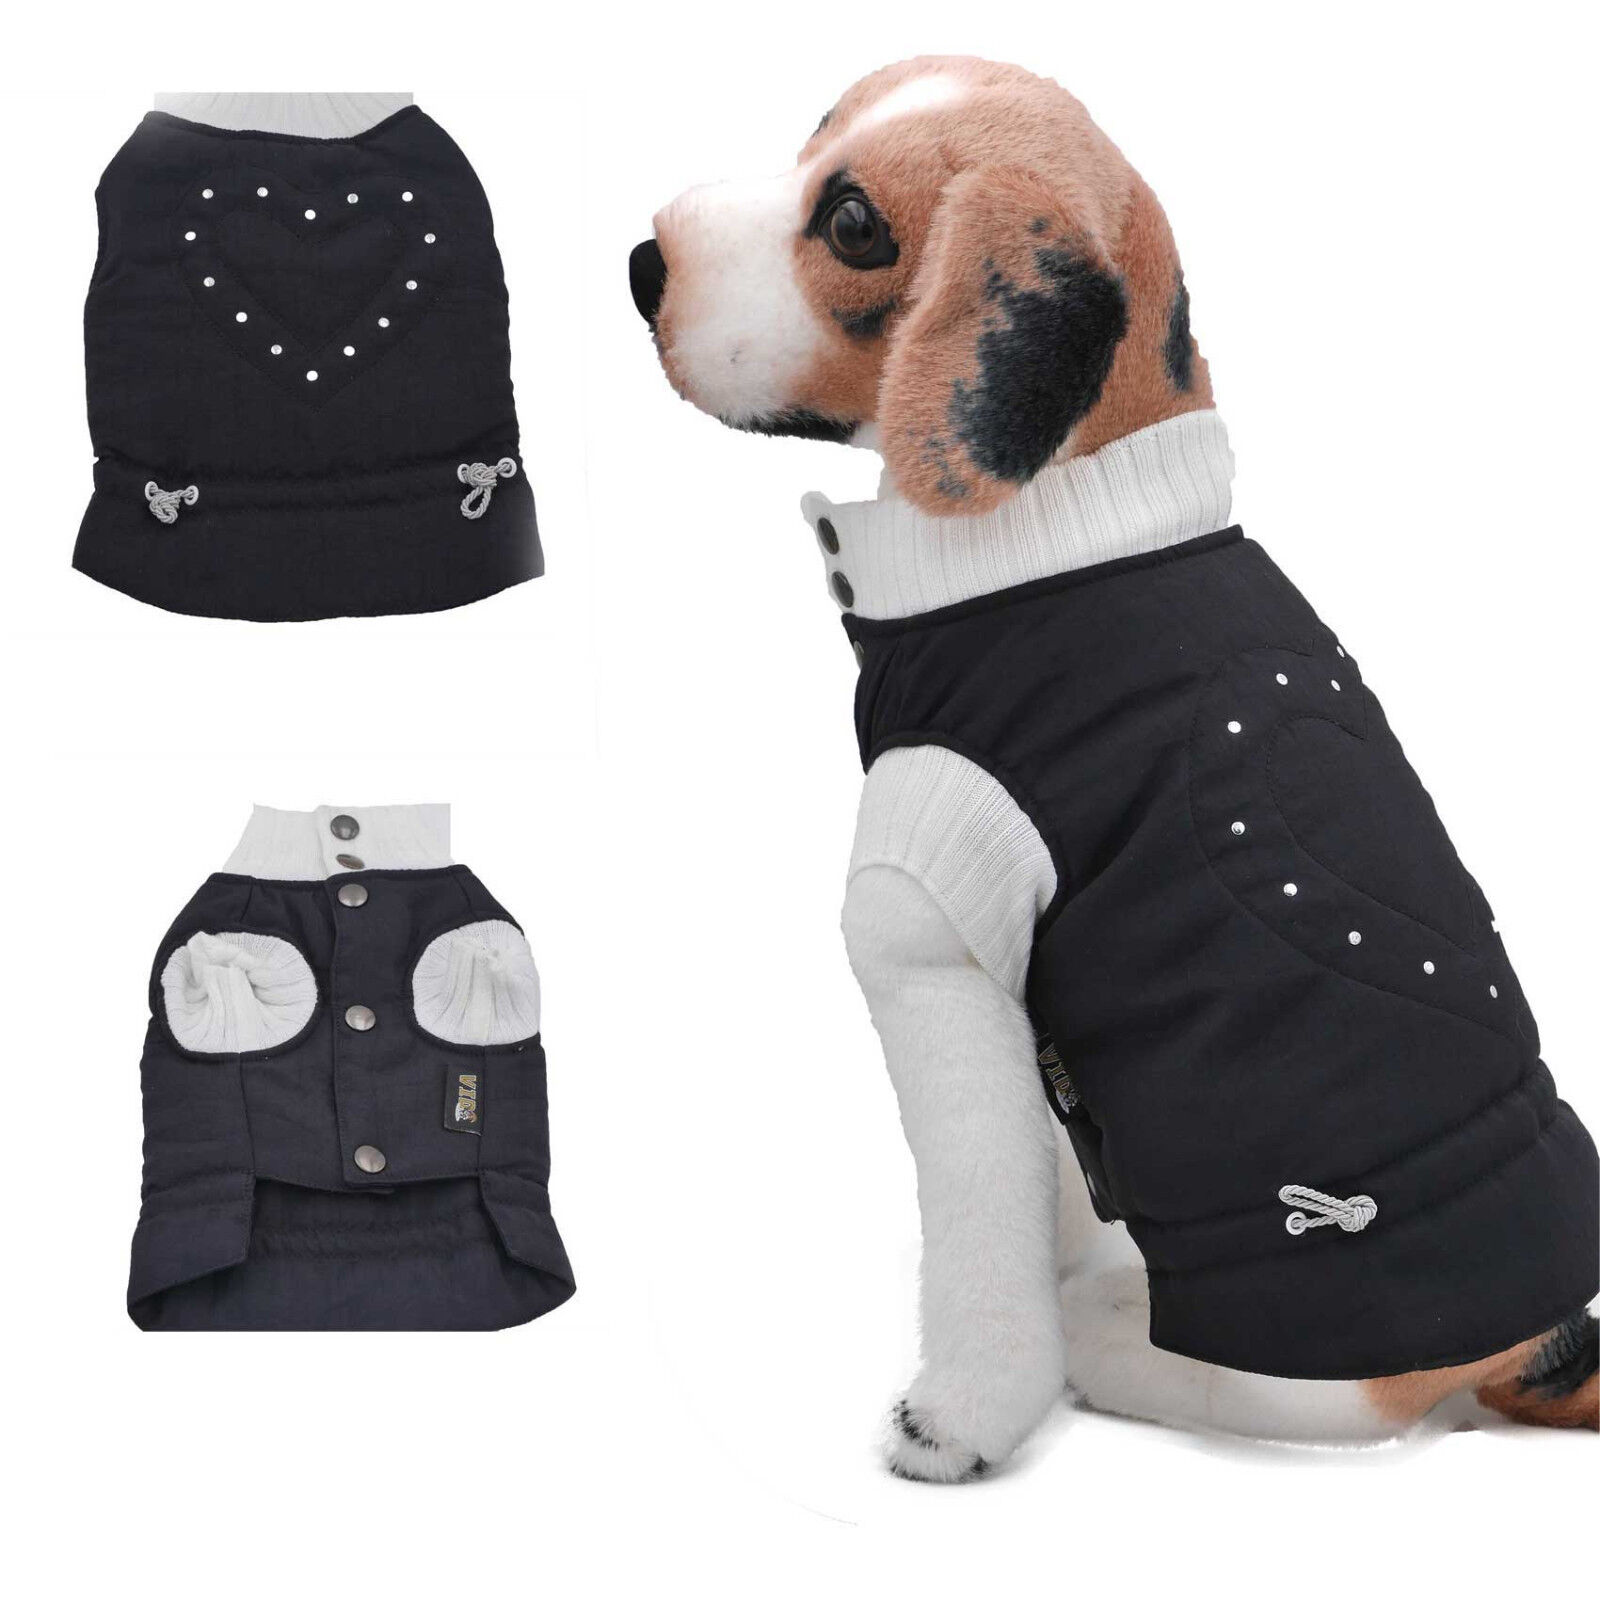 Hunde Winter Mantel Steppweste Dogi Fashion exklusiv schwarz Herzilein   | Economy